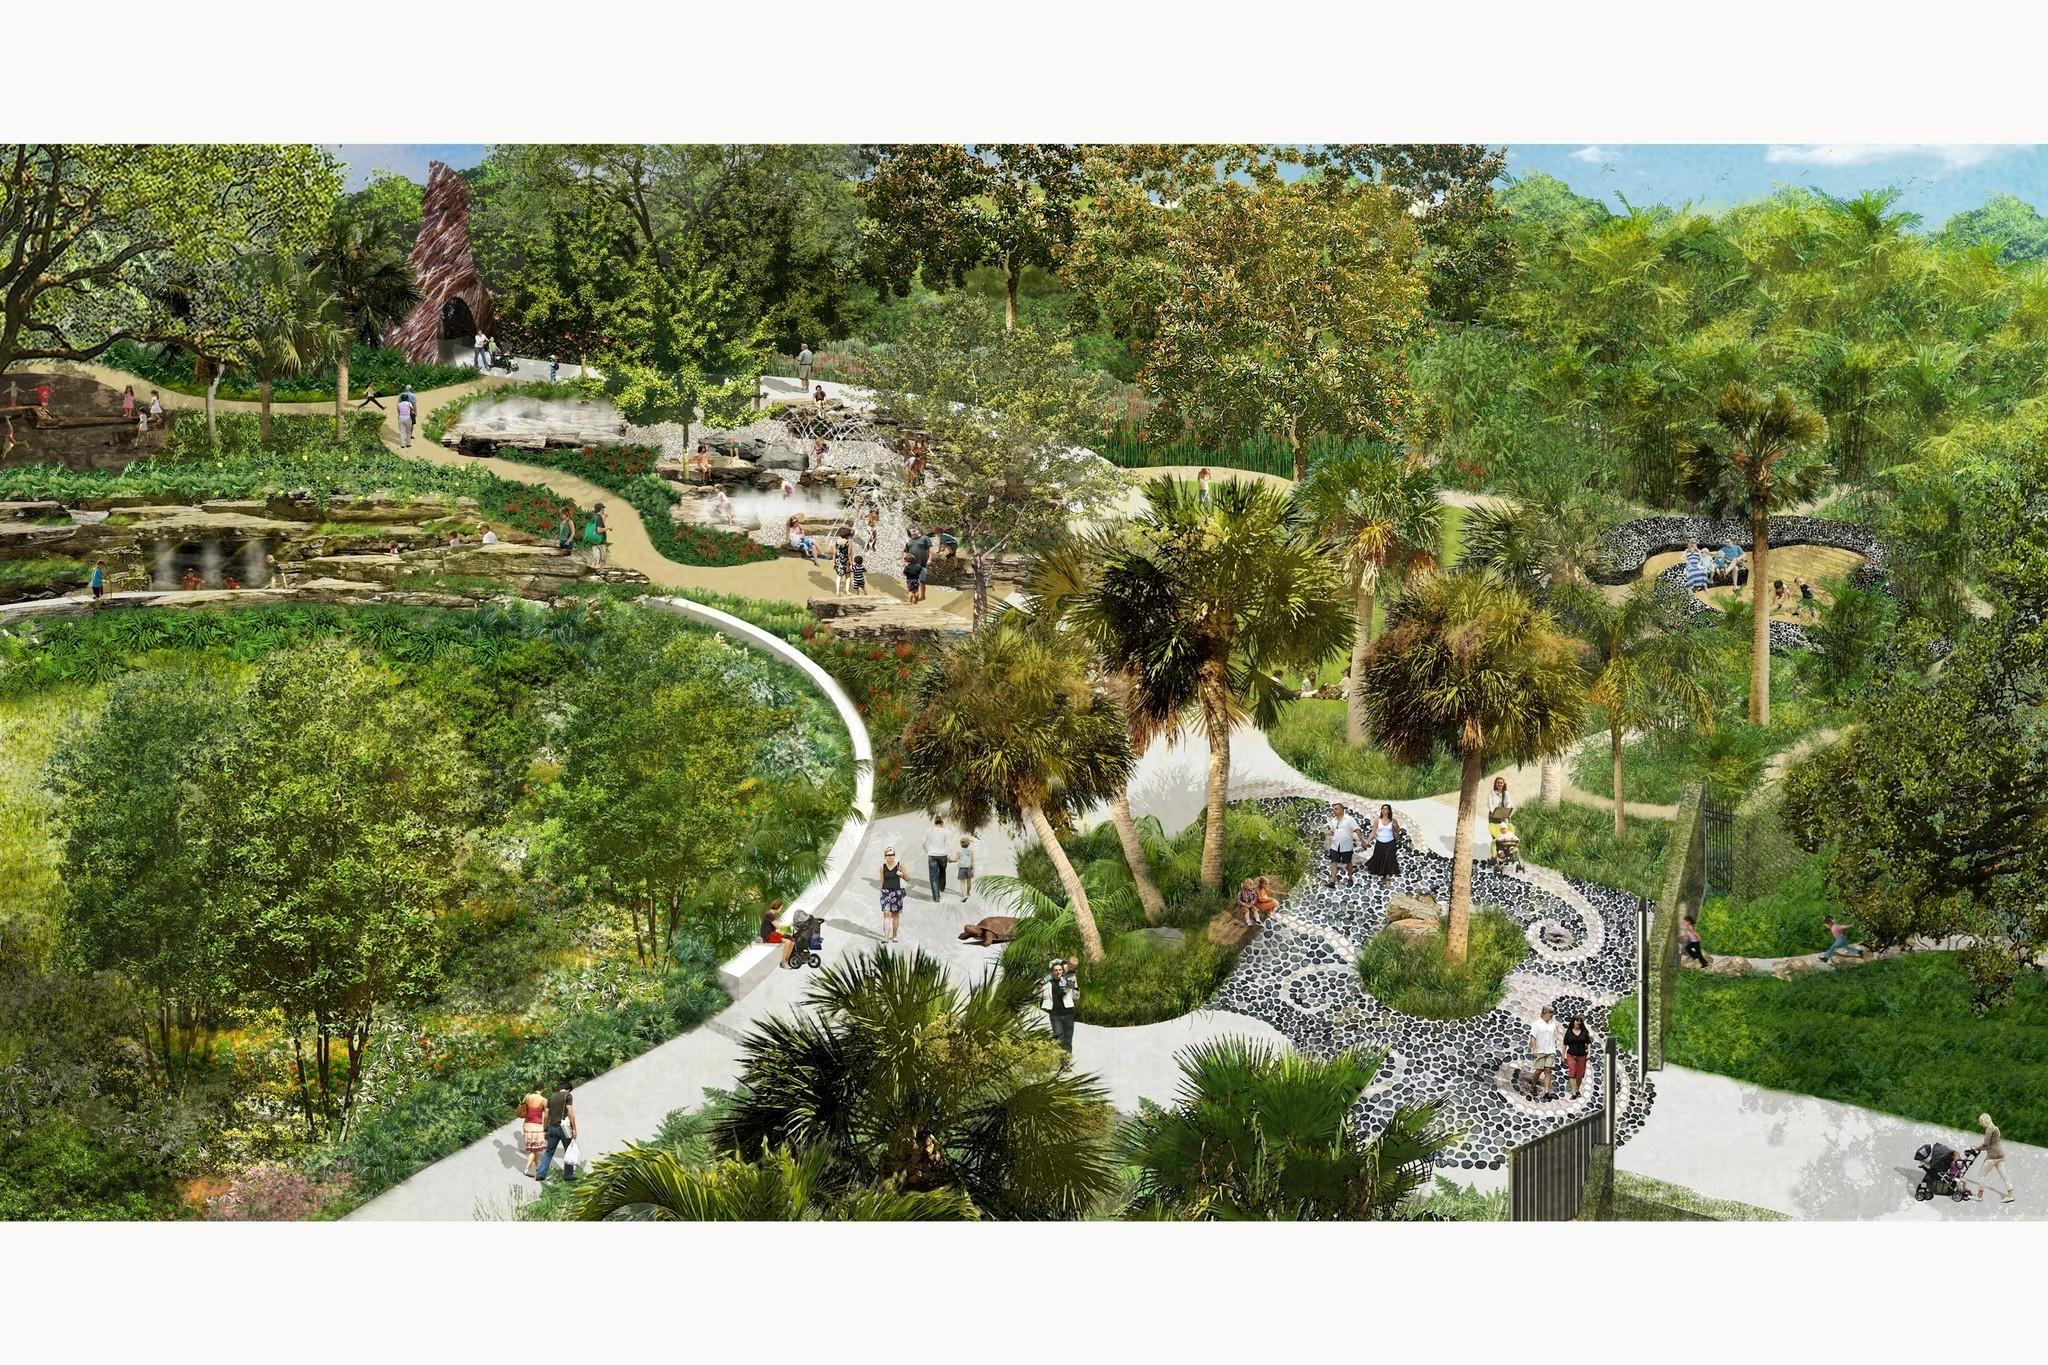 Bok Tower Gardens breaking ground on major expansion Orlando